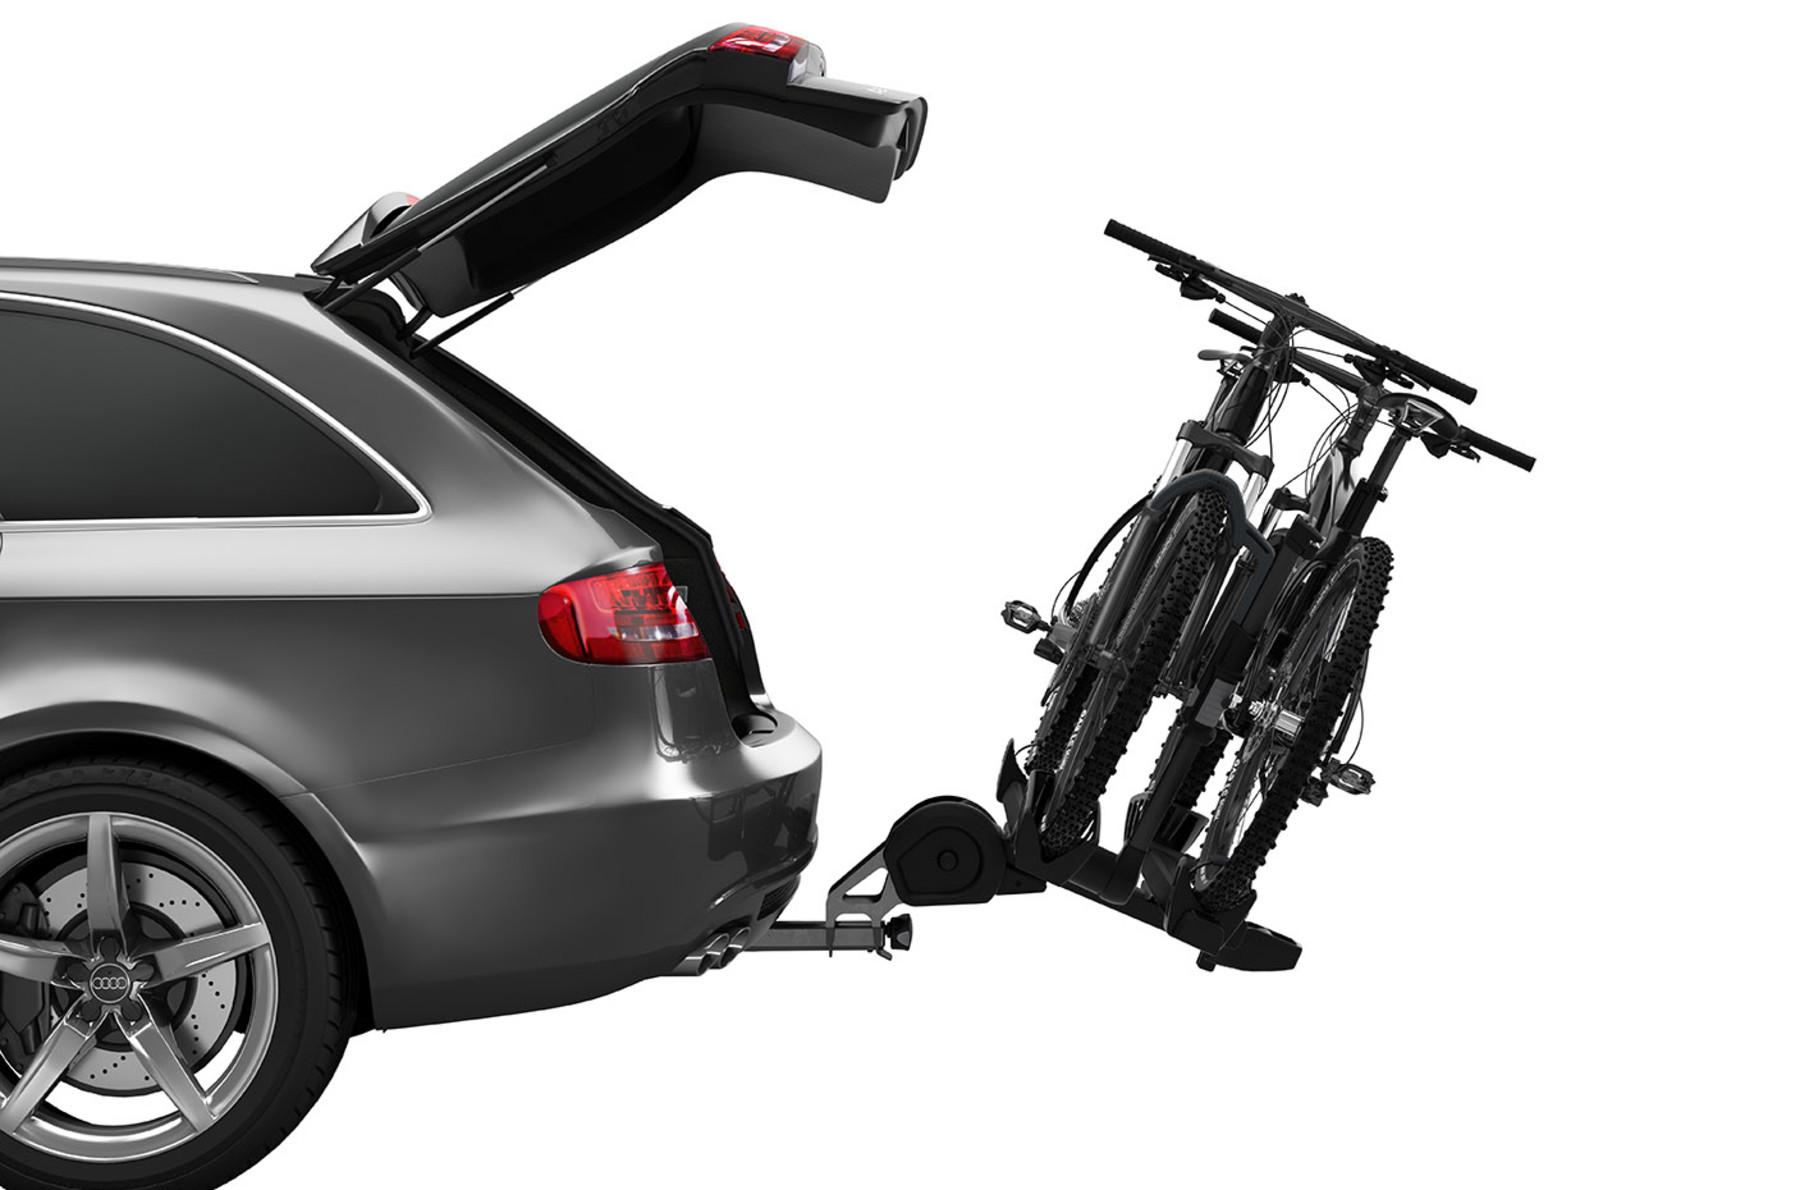 Thule T2 Pro XT 2 Bike Carrier - Hitch Bike Rack (50mm Tow Receiver)